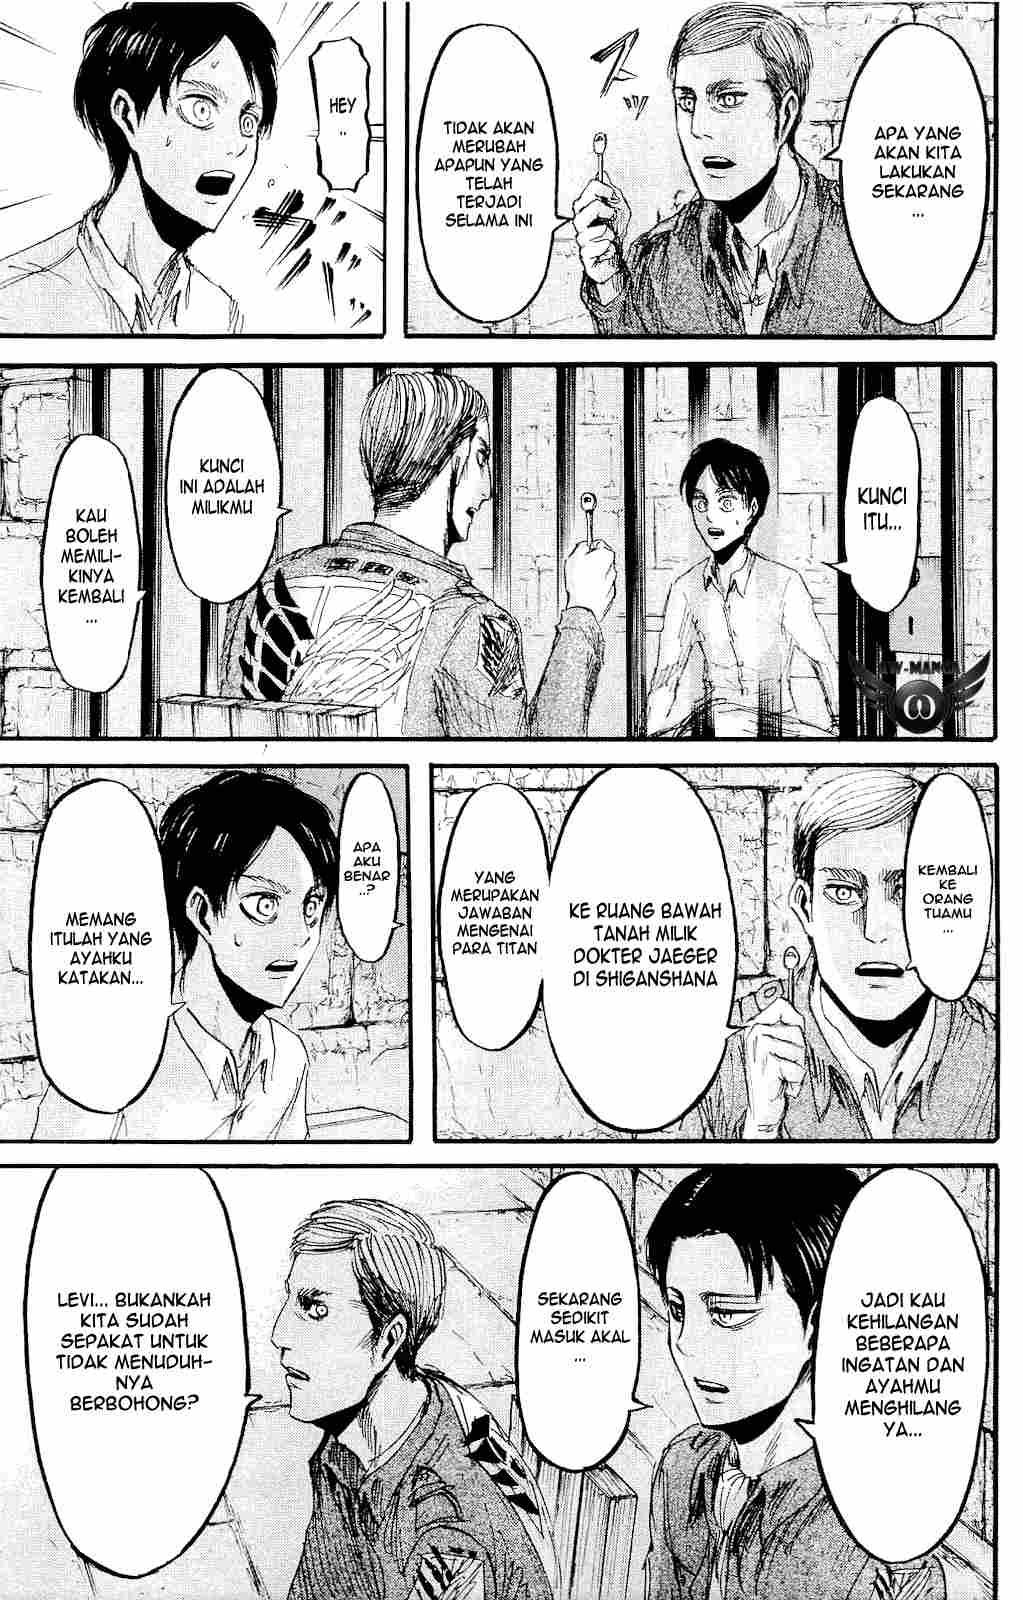 Komik shingeki no kyojin 018 - sekarang apa yang harus dilakukan 19 Indonesia shingeki no kyojin 018 - sekarang apa yang harus dilakukan Terbaru 36|Baca Manga Komik Indonesia|